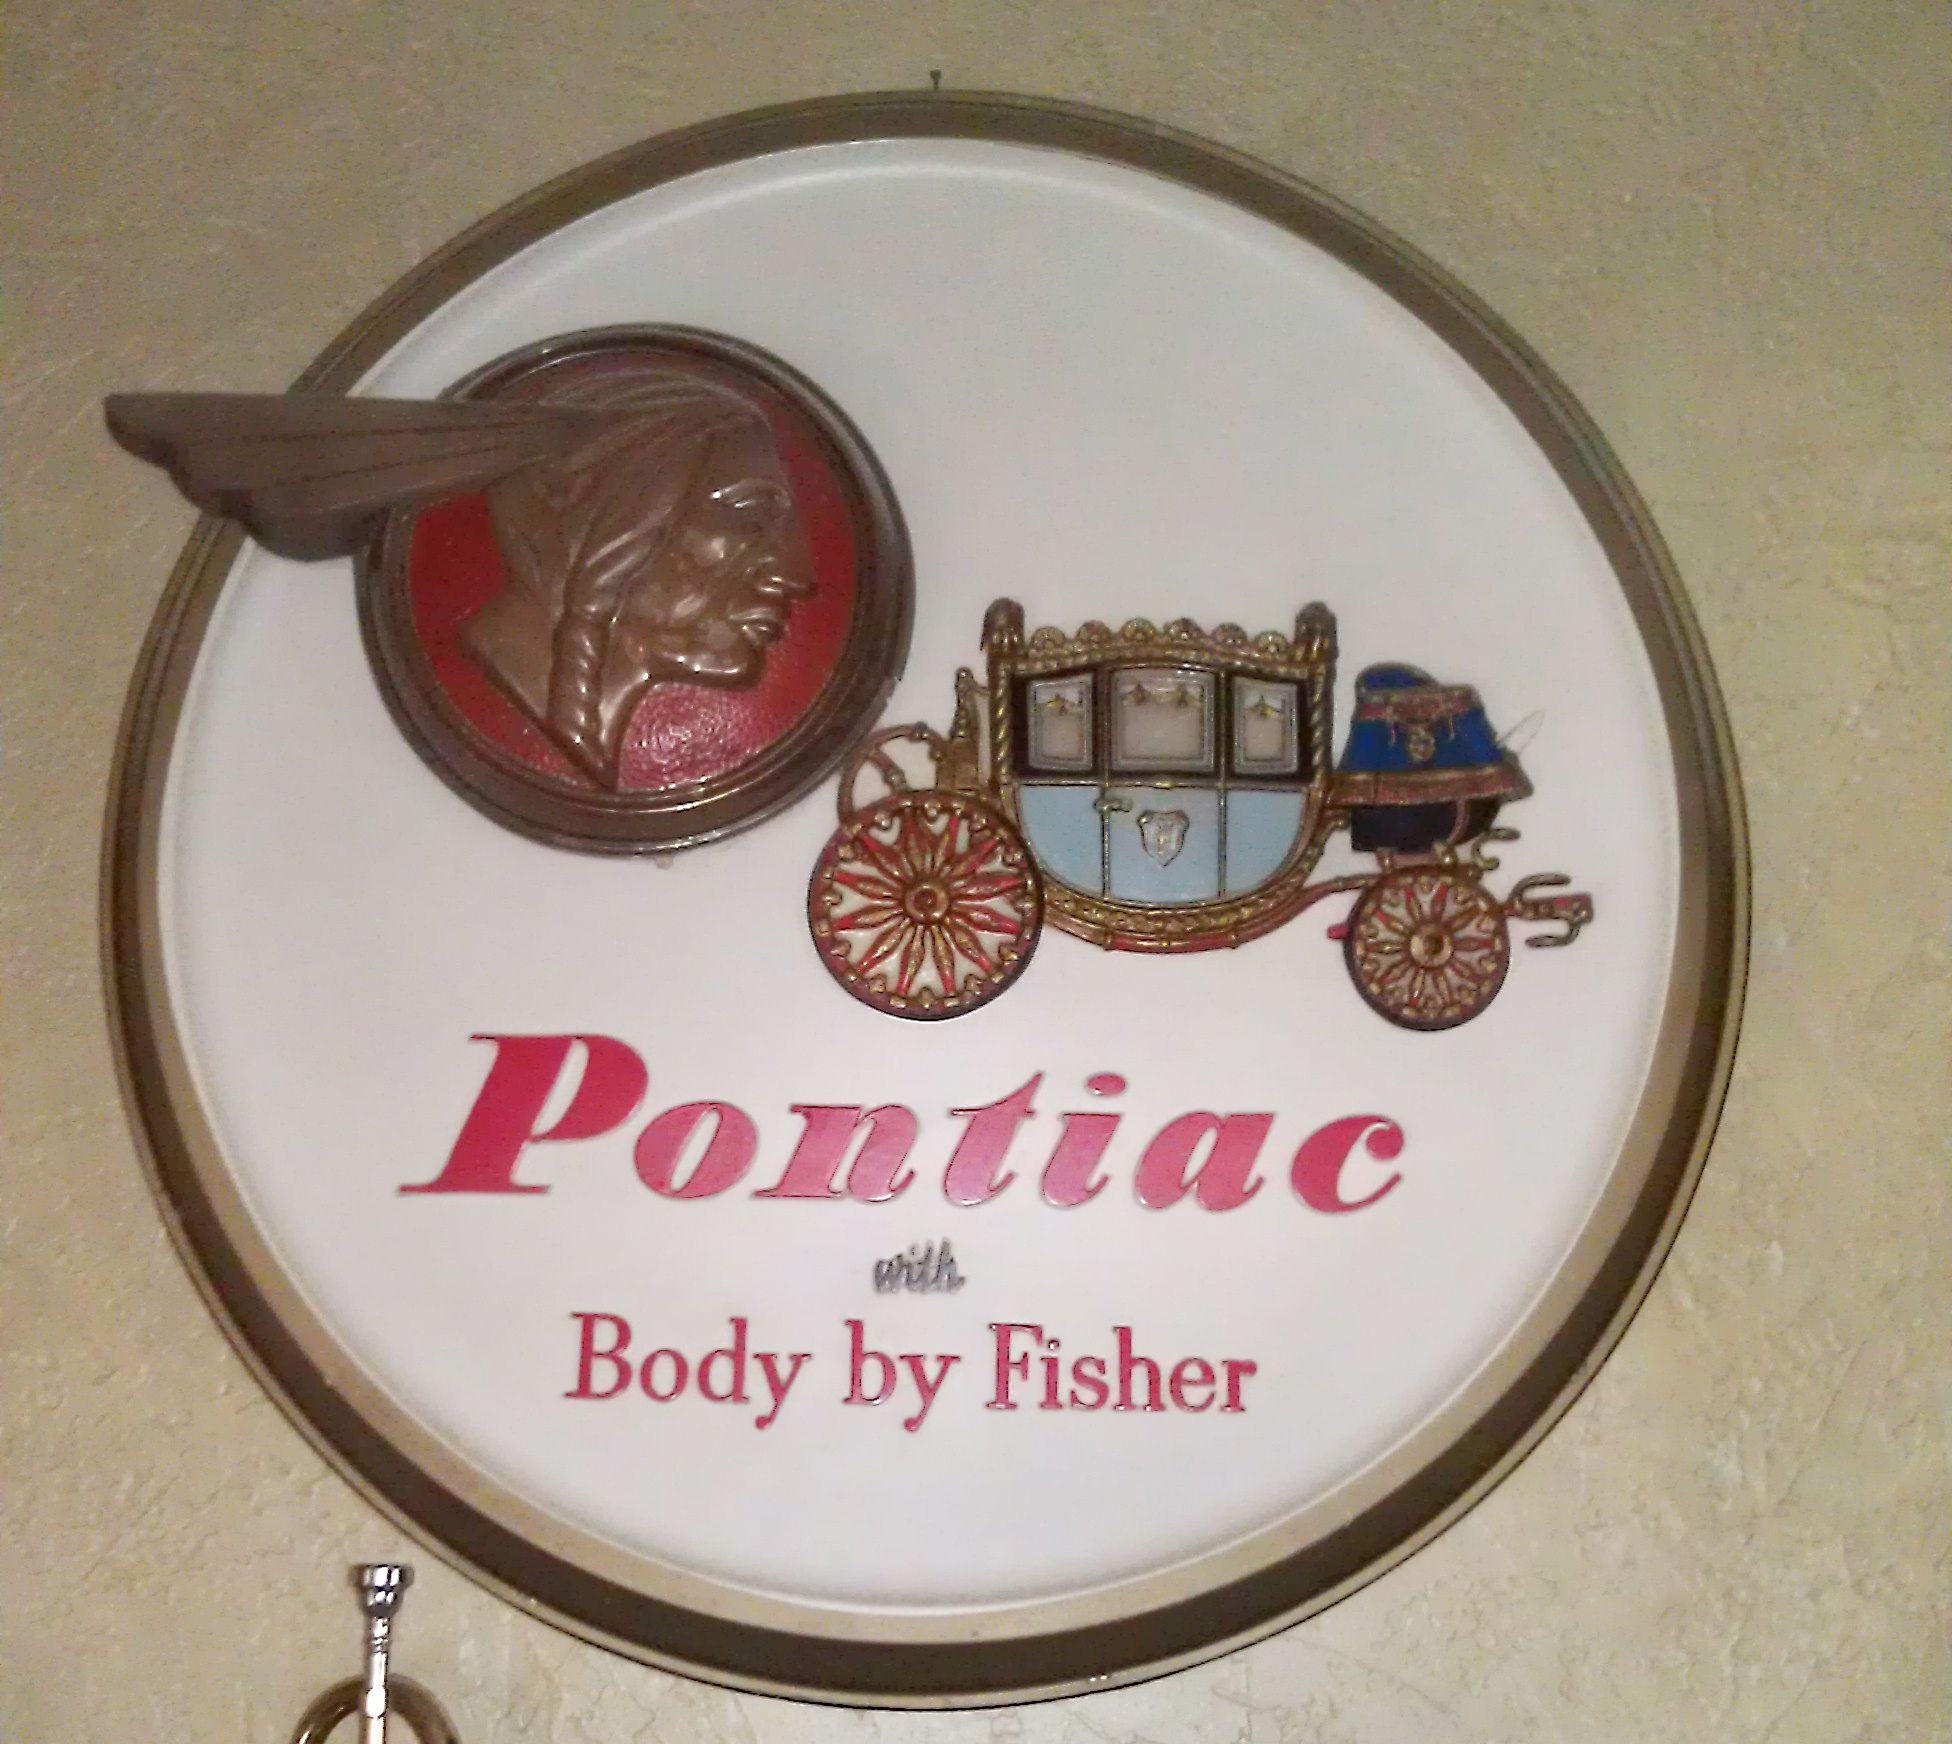 Vintage Pontiac Dealership: Sign From A Pontiac Dealer In The 1940s